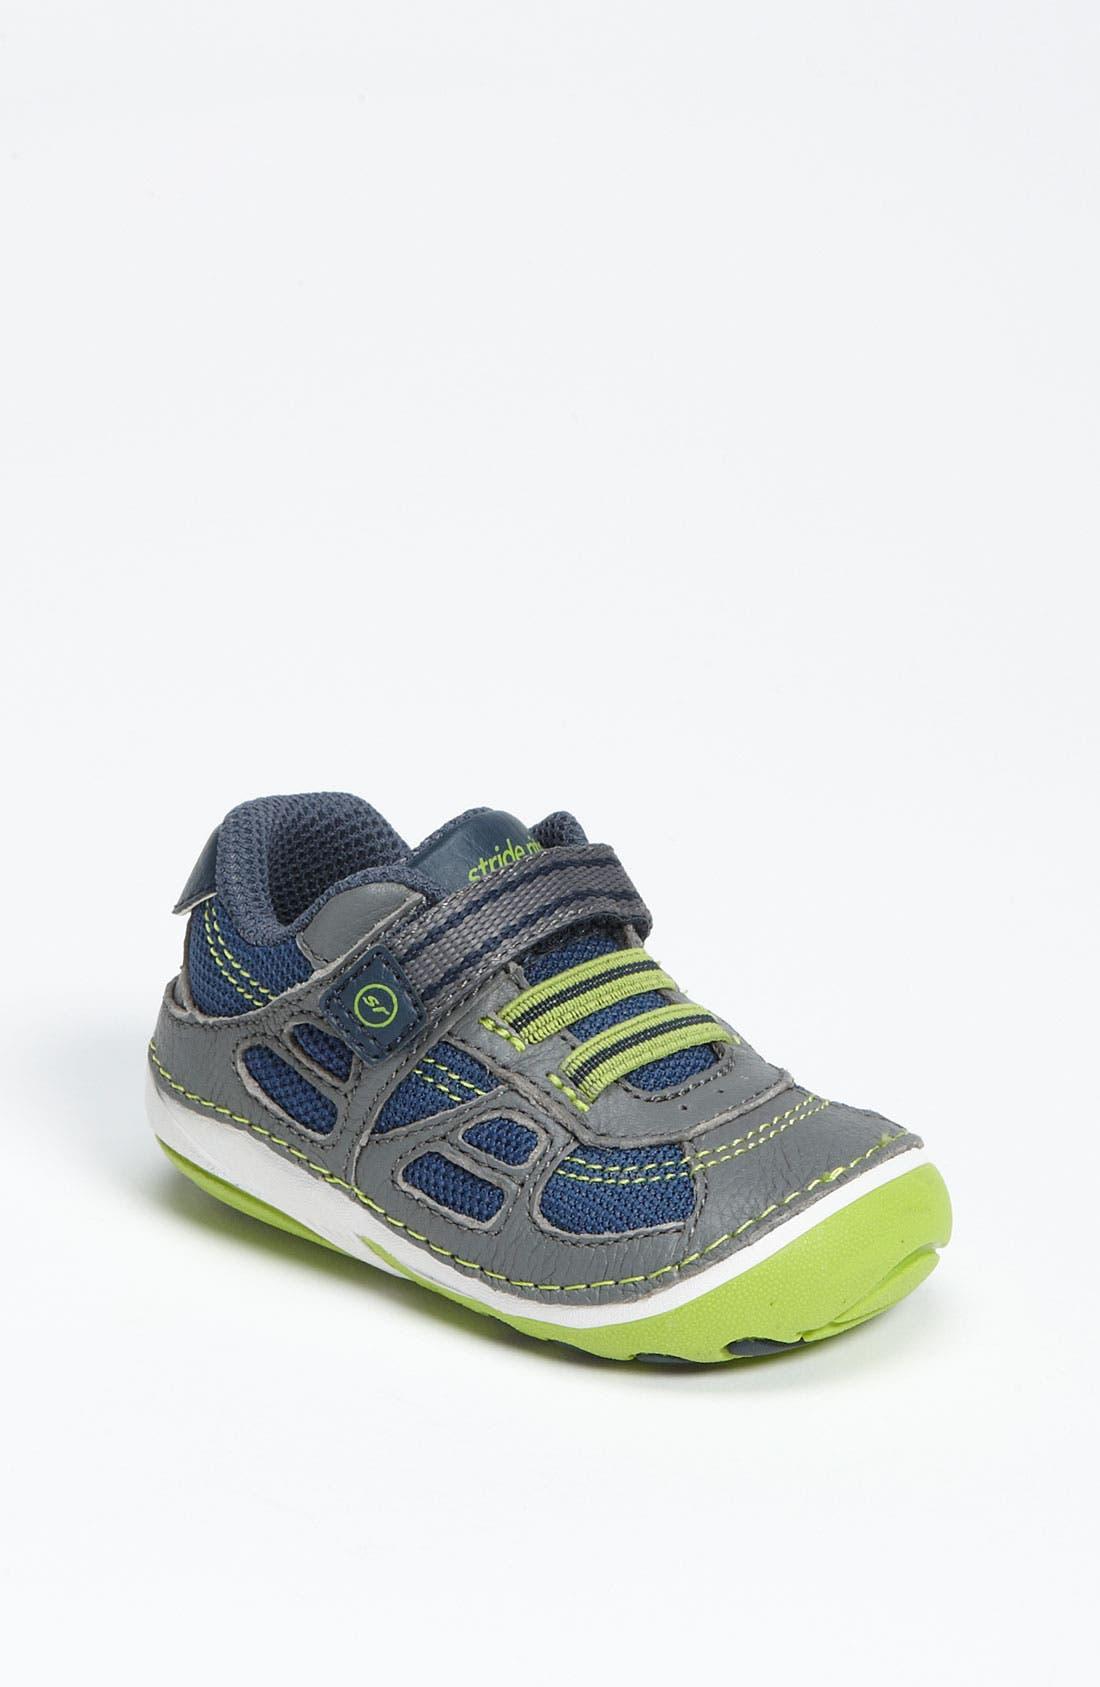 Alternate Image 1 Selected - Stride Rite 'Conner' Sneaker (Baby & Walker)